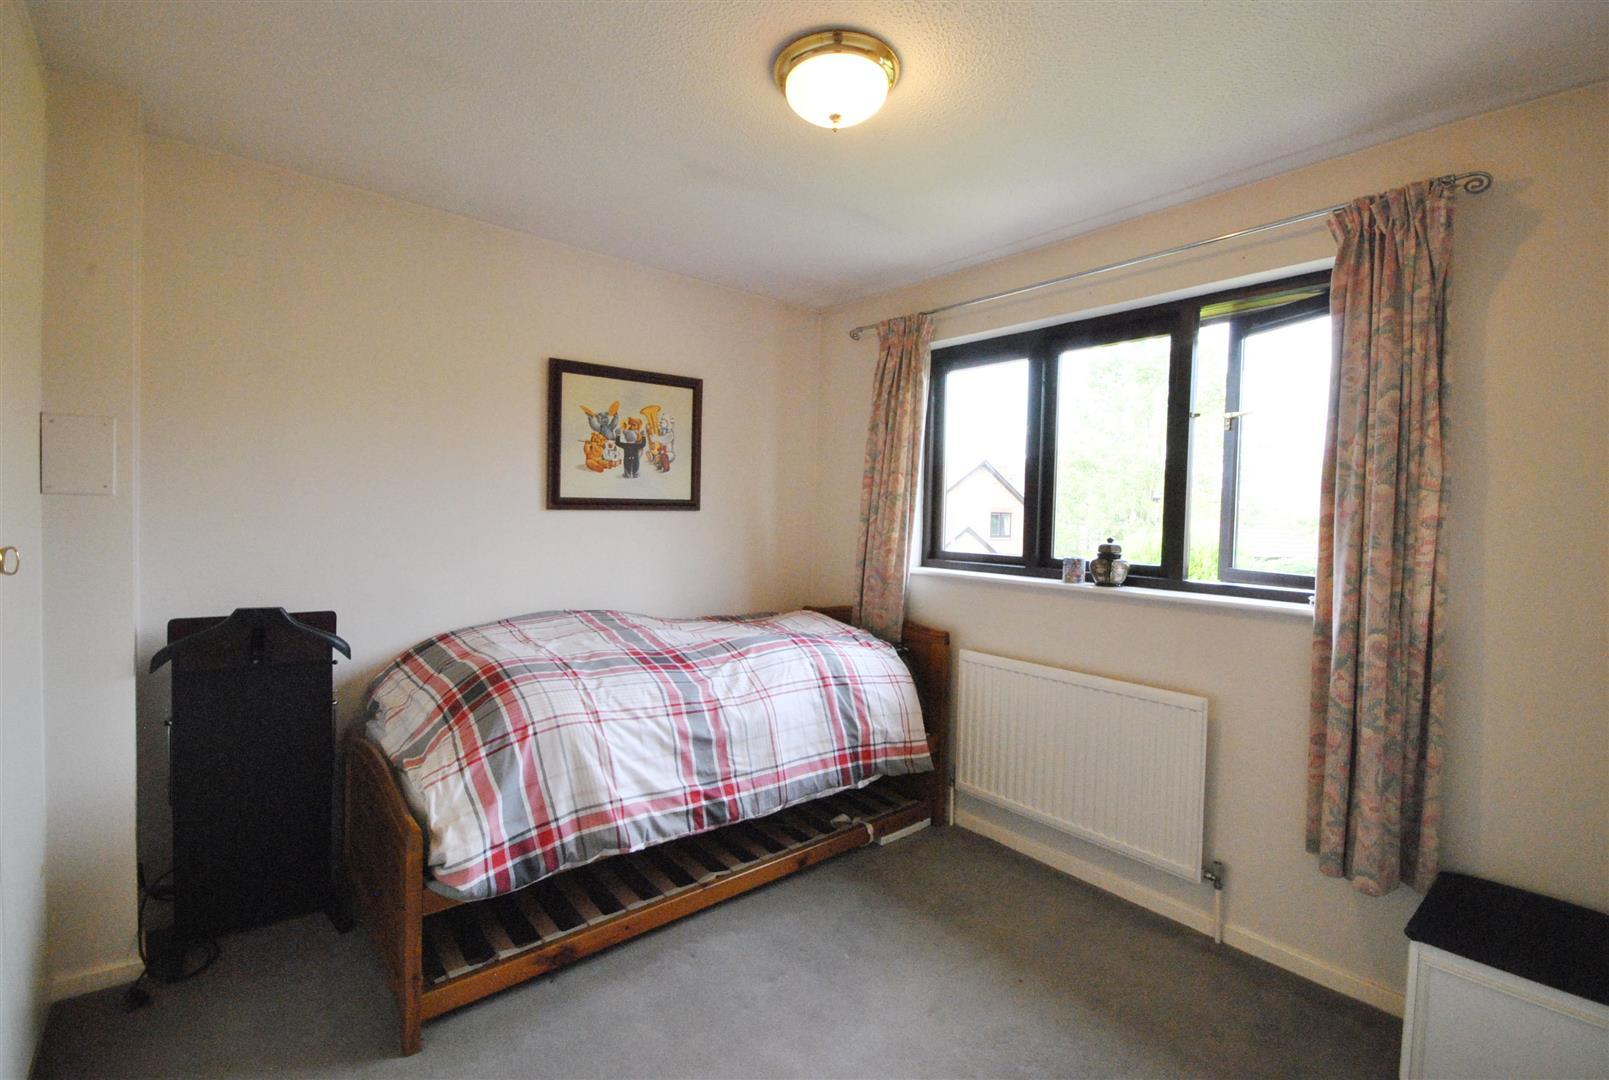 4 Bedrooms, House - Detached